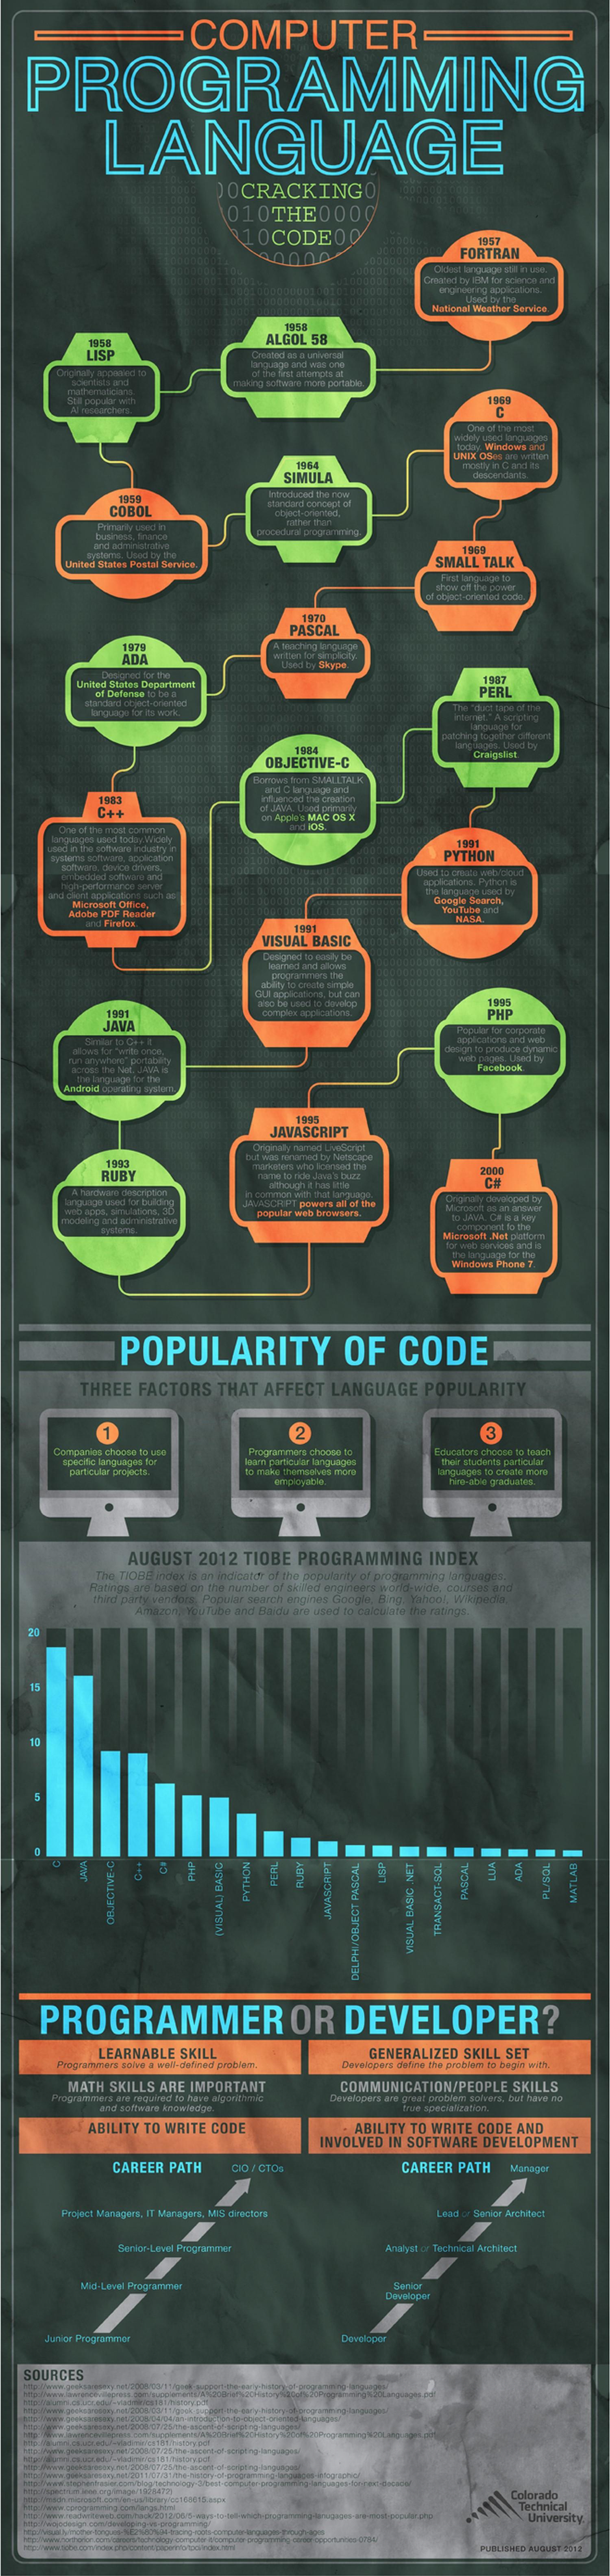 Evolution of Computer Programming Language